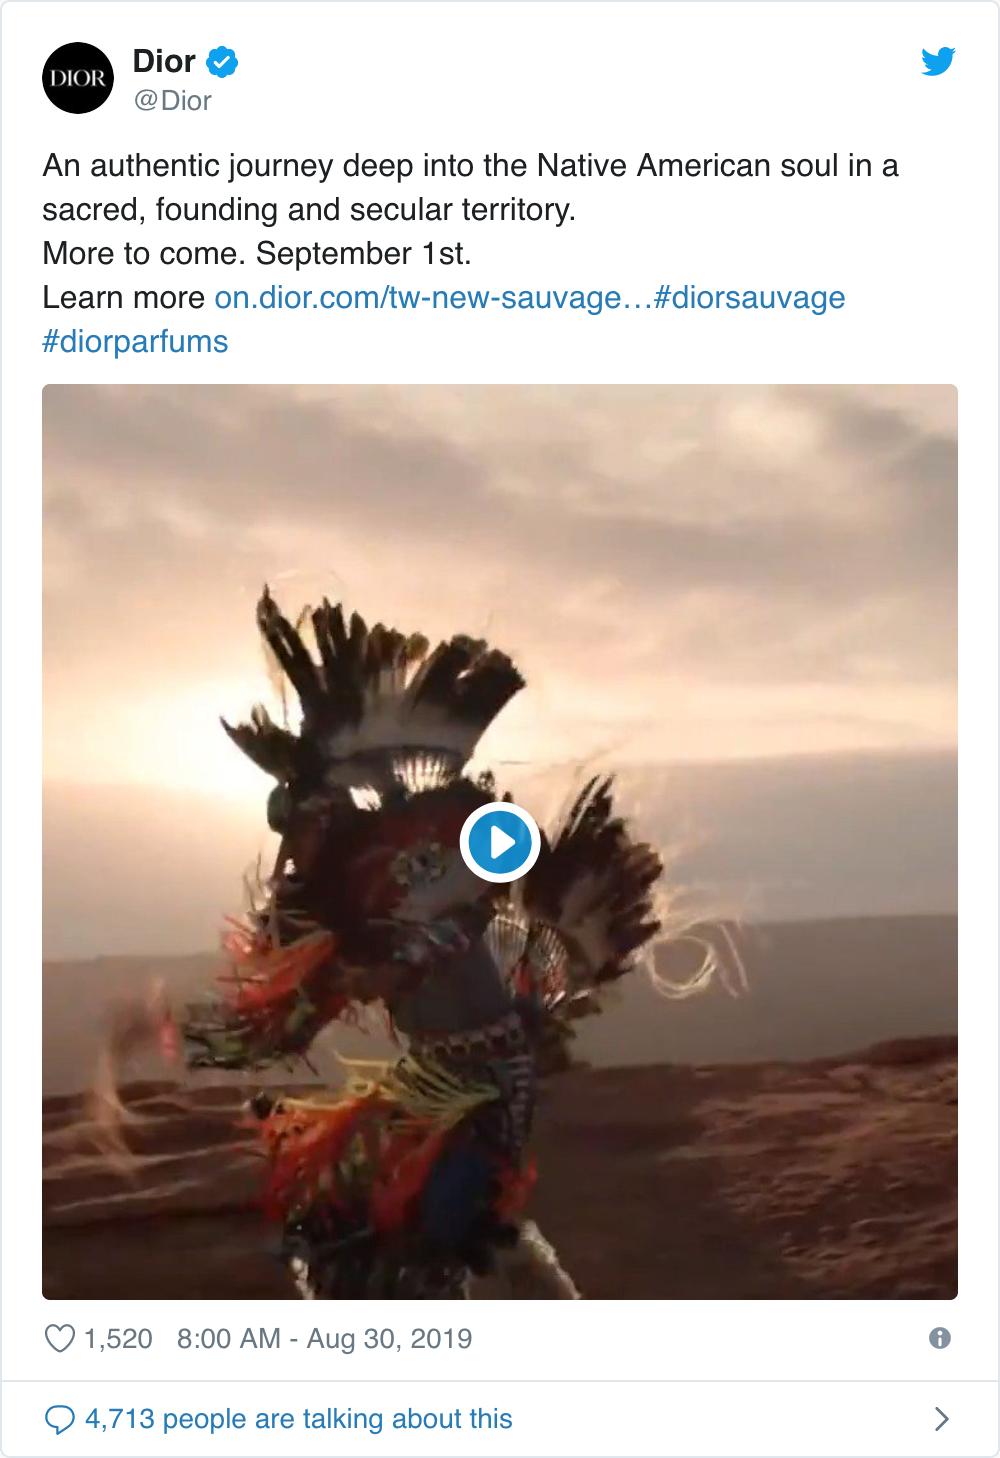 A screenshot of Dior's tweet showing a Native American dancer.